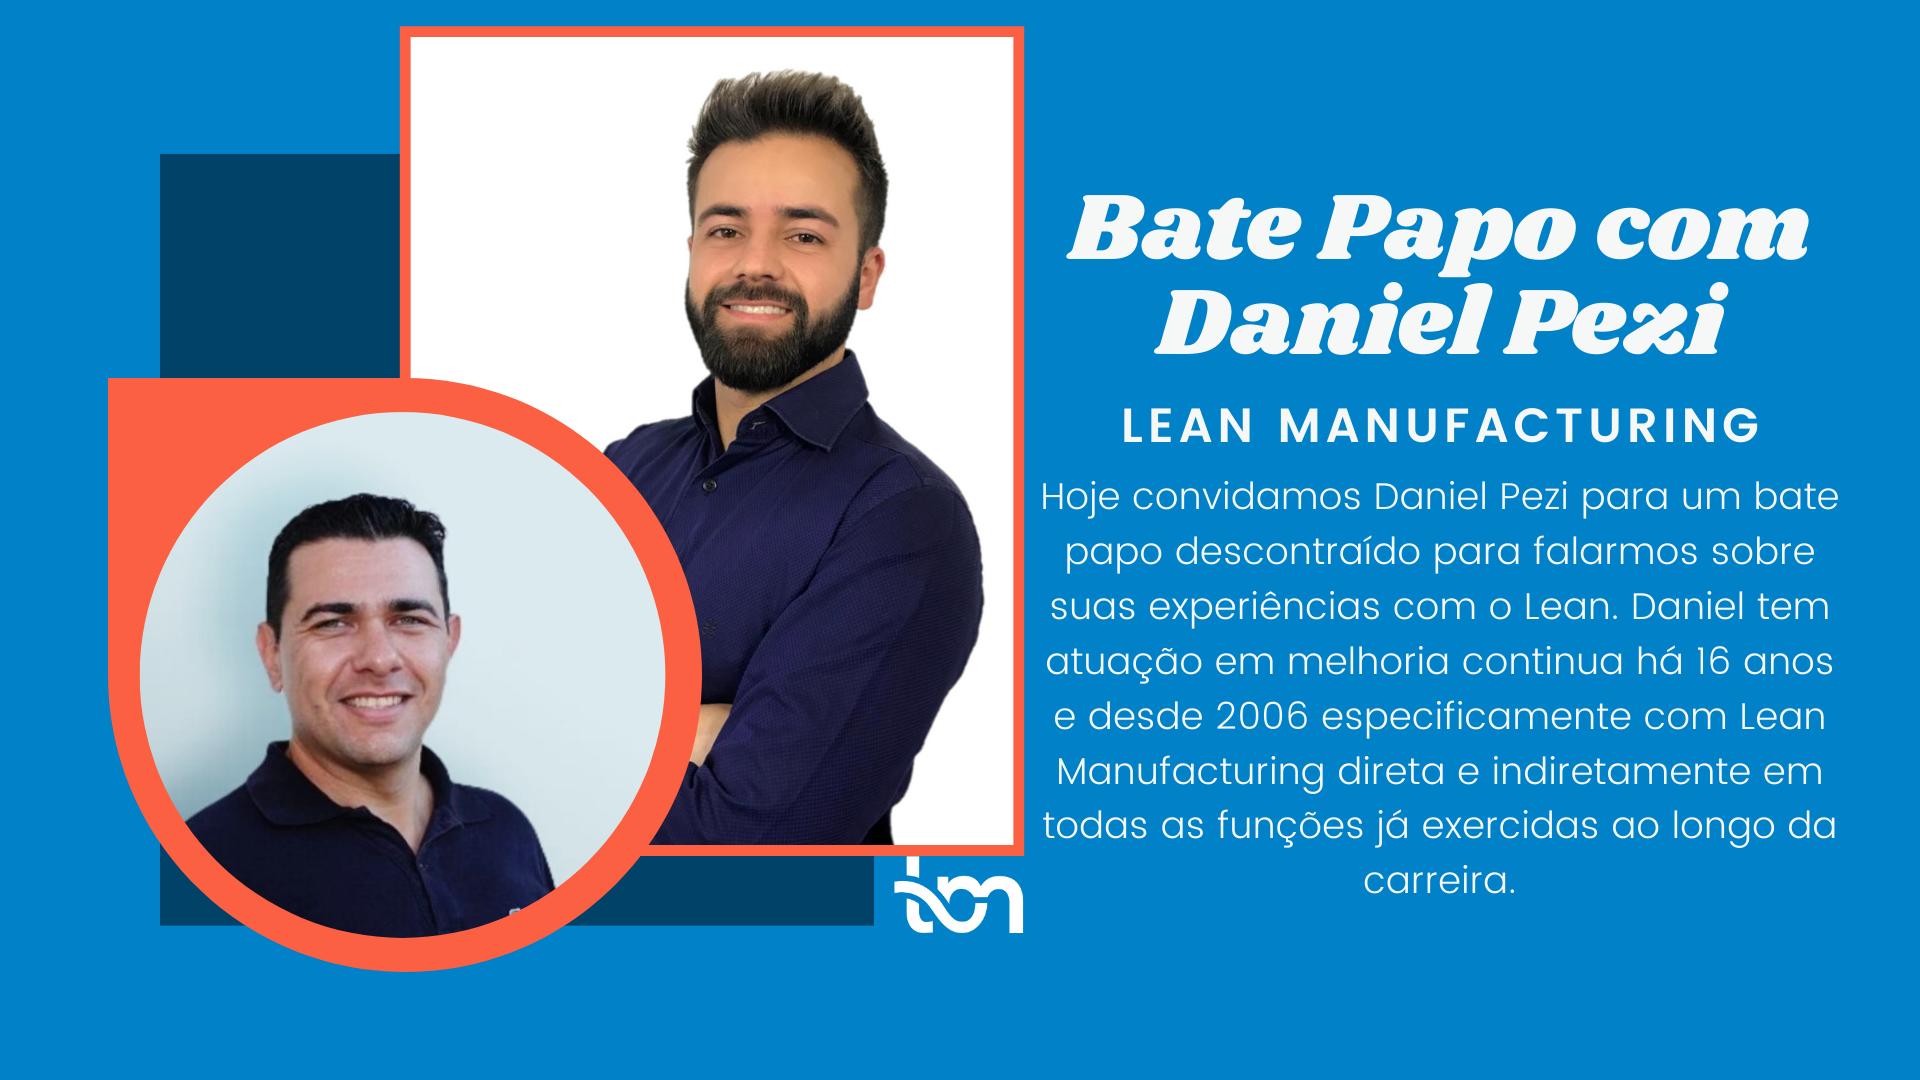 Bate Papo com Daniel Pezi